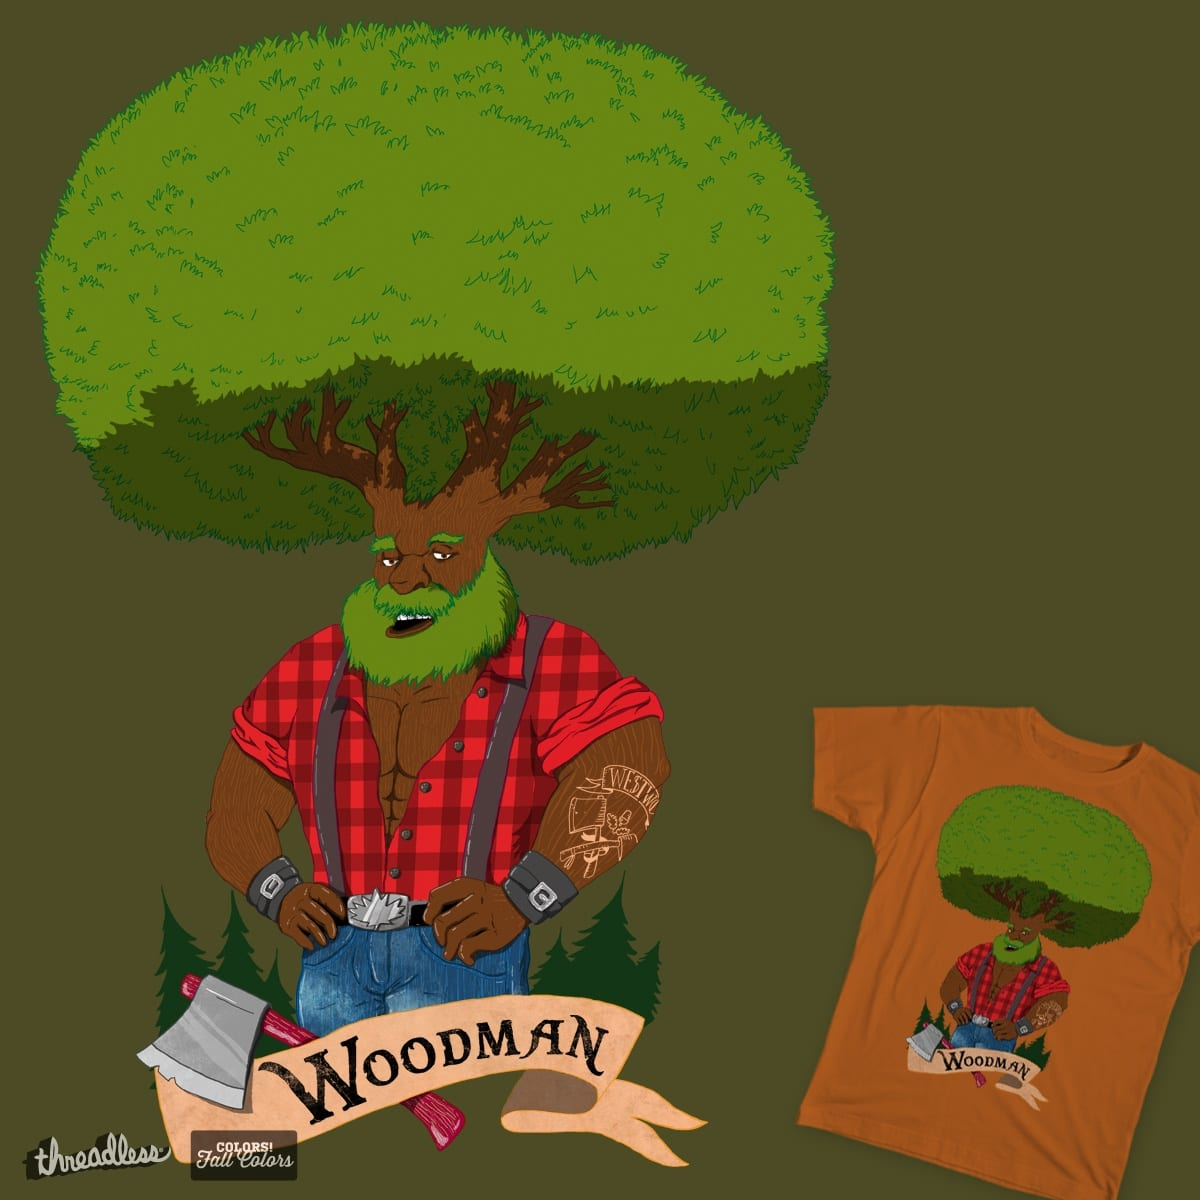 Woodman by CathyChene on Threadless